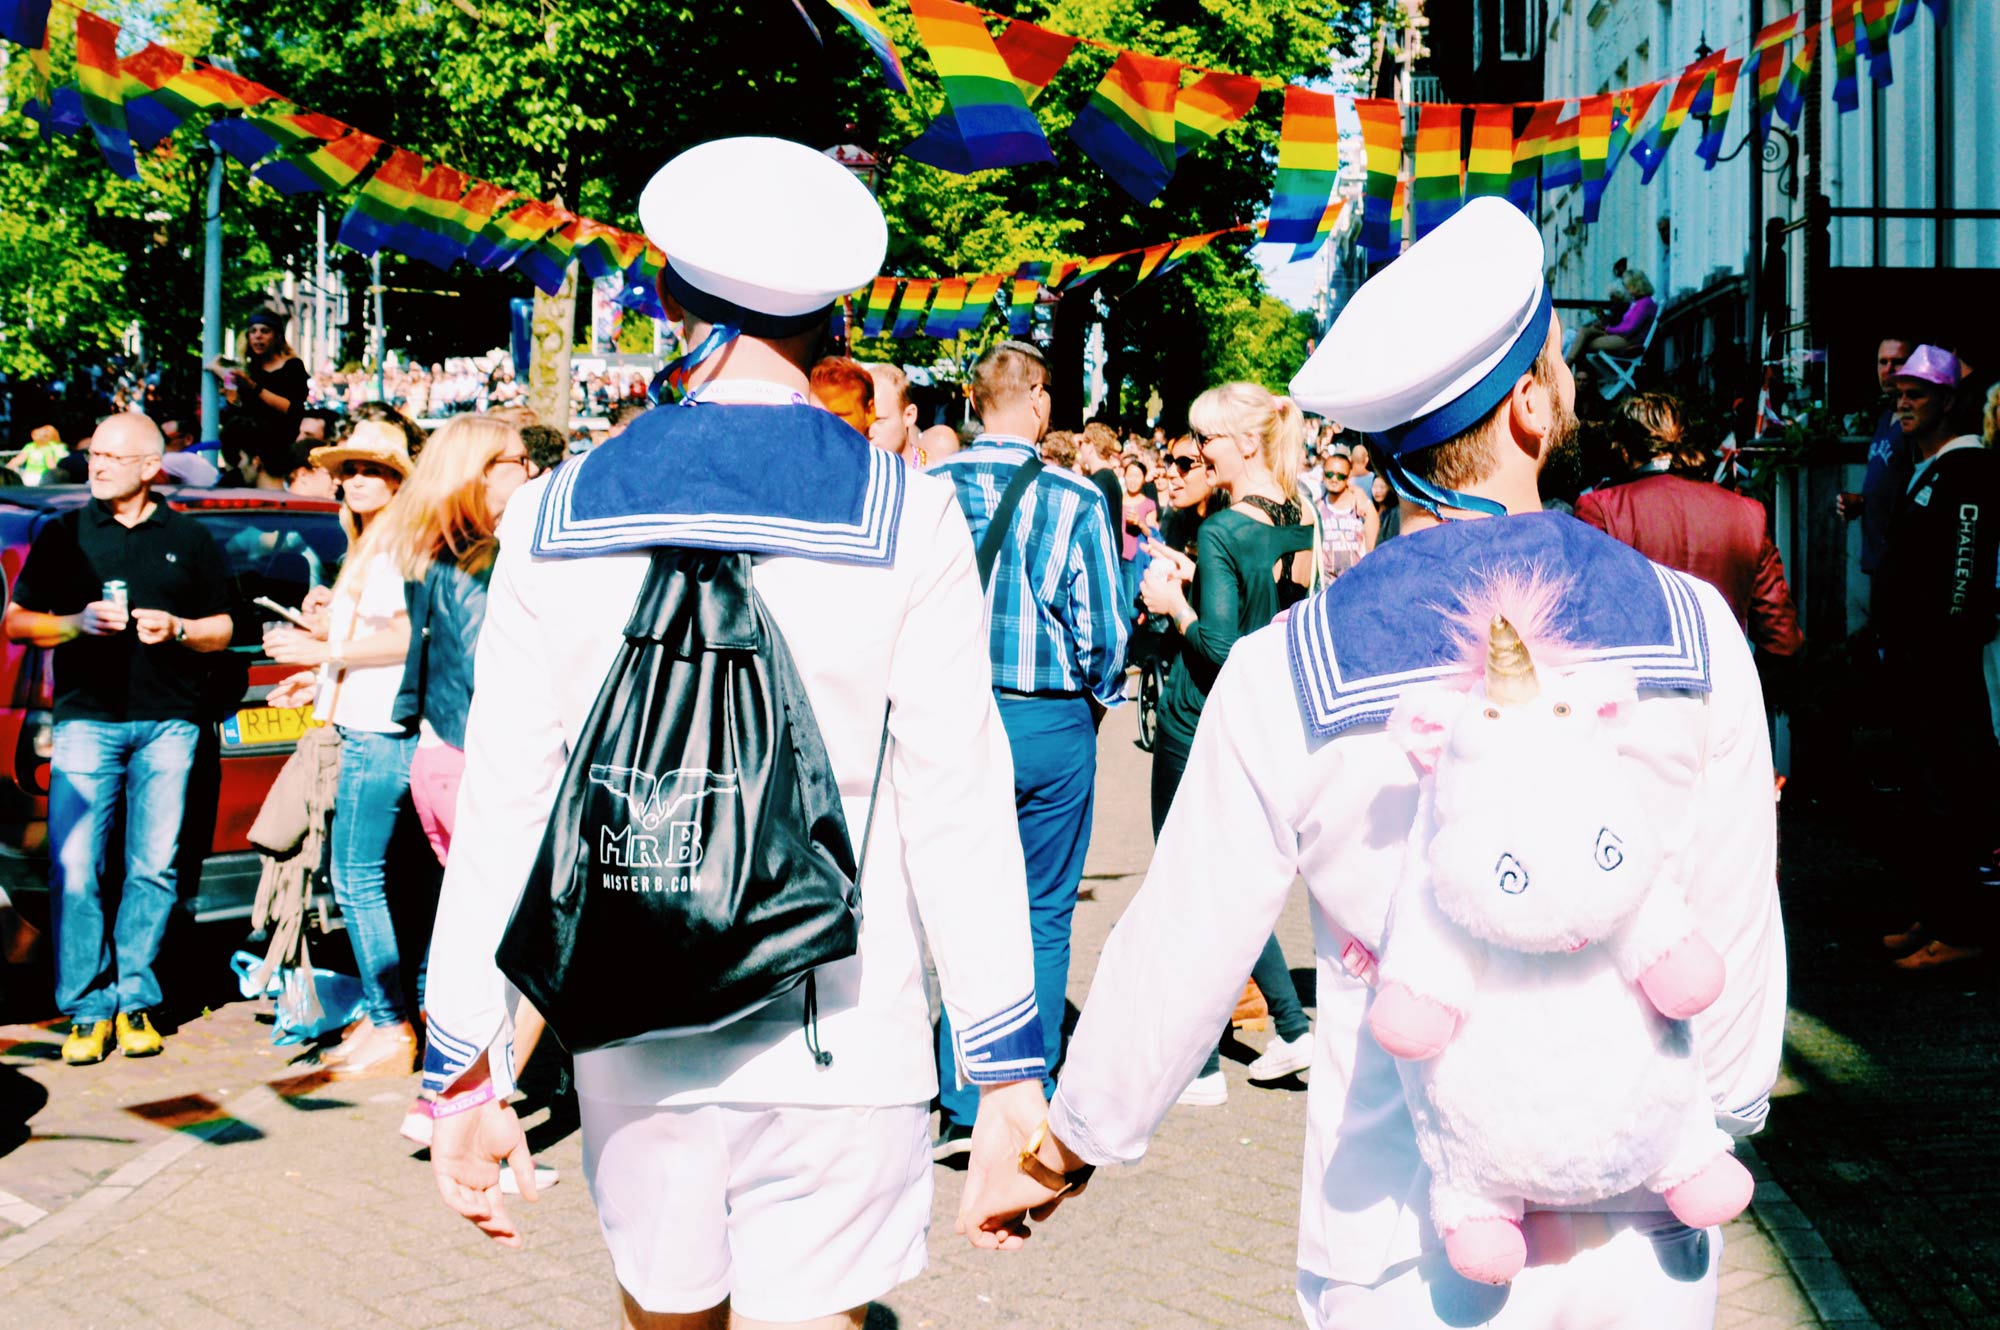 Gay Pride Amsterdam Programm Höhepunkte Tipps Amsterdam Canal Gay Pride Program Highlights Tips © CoupleofMen.com